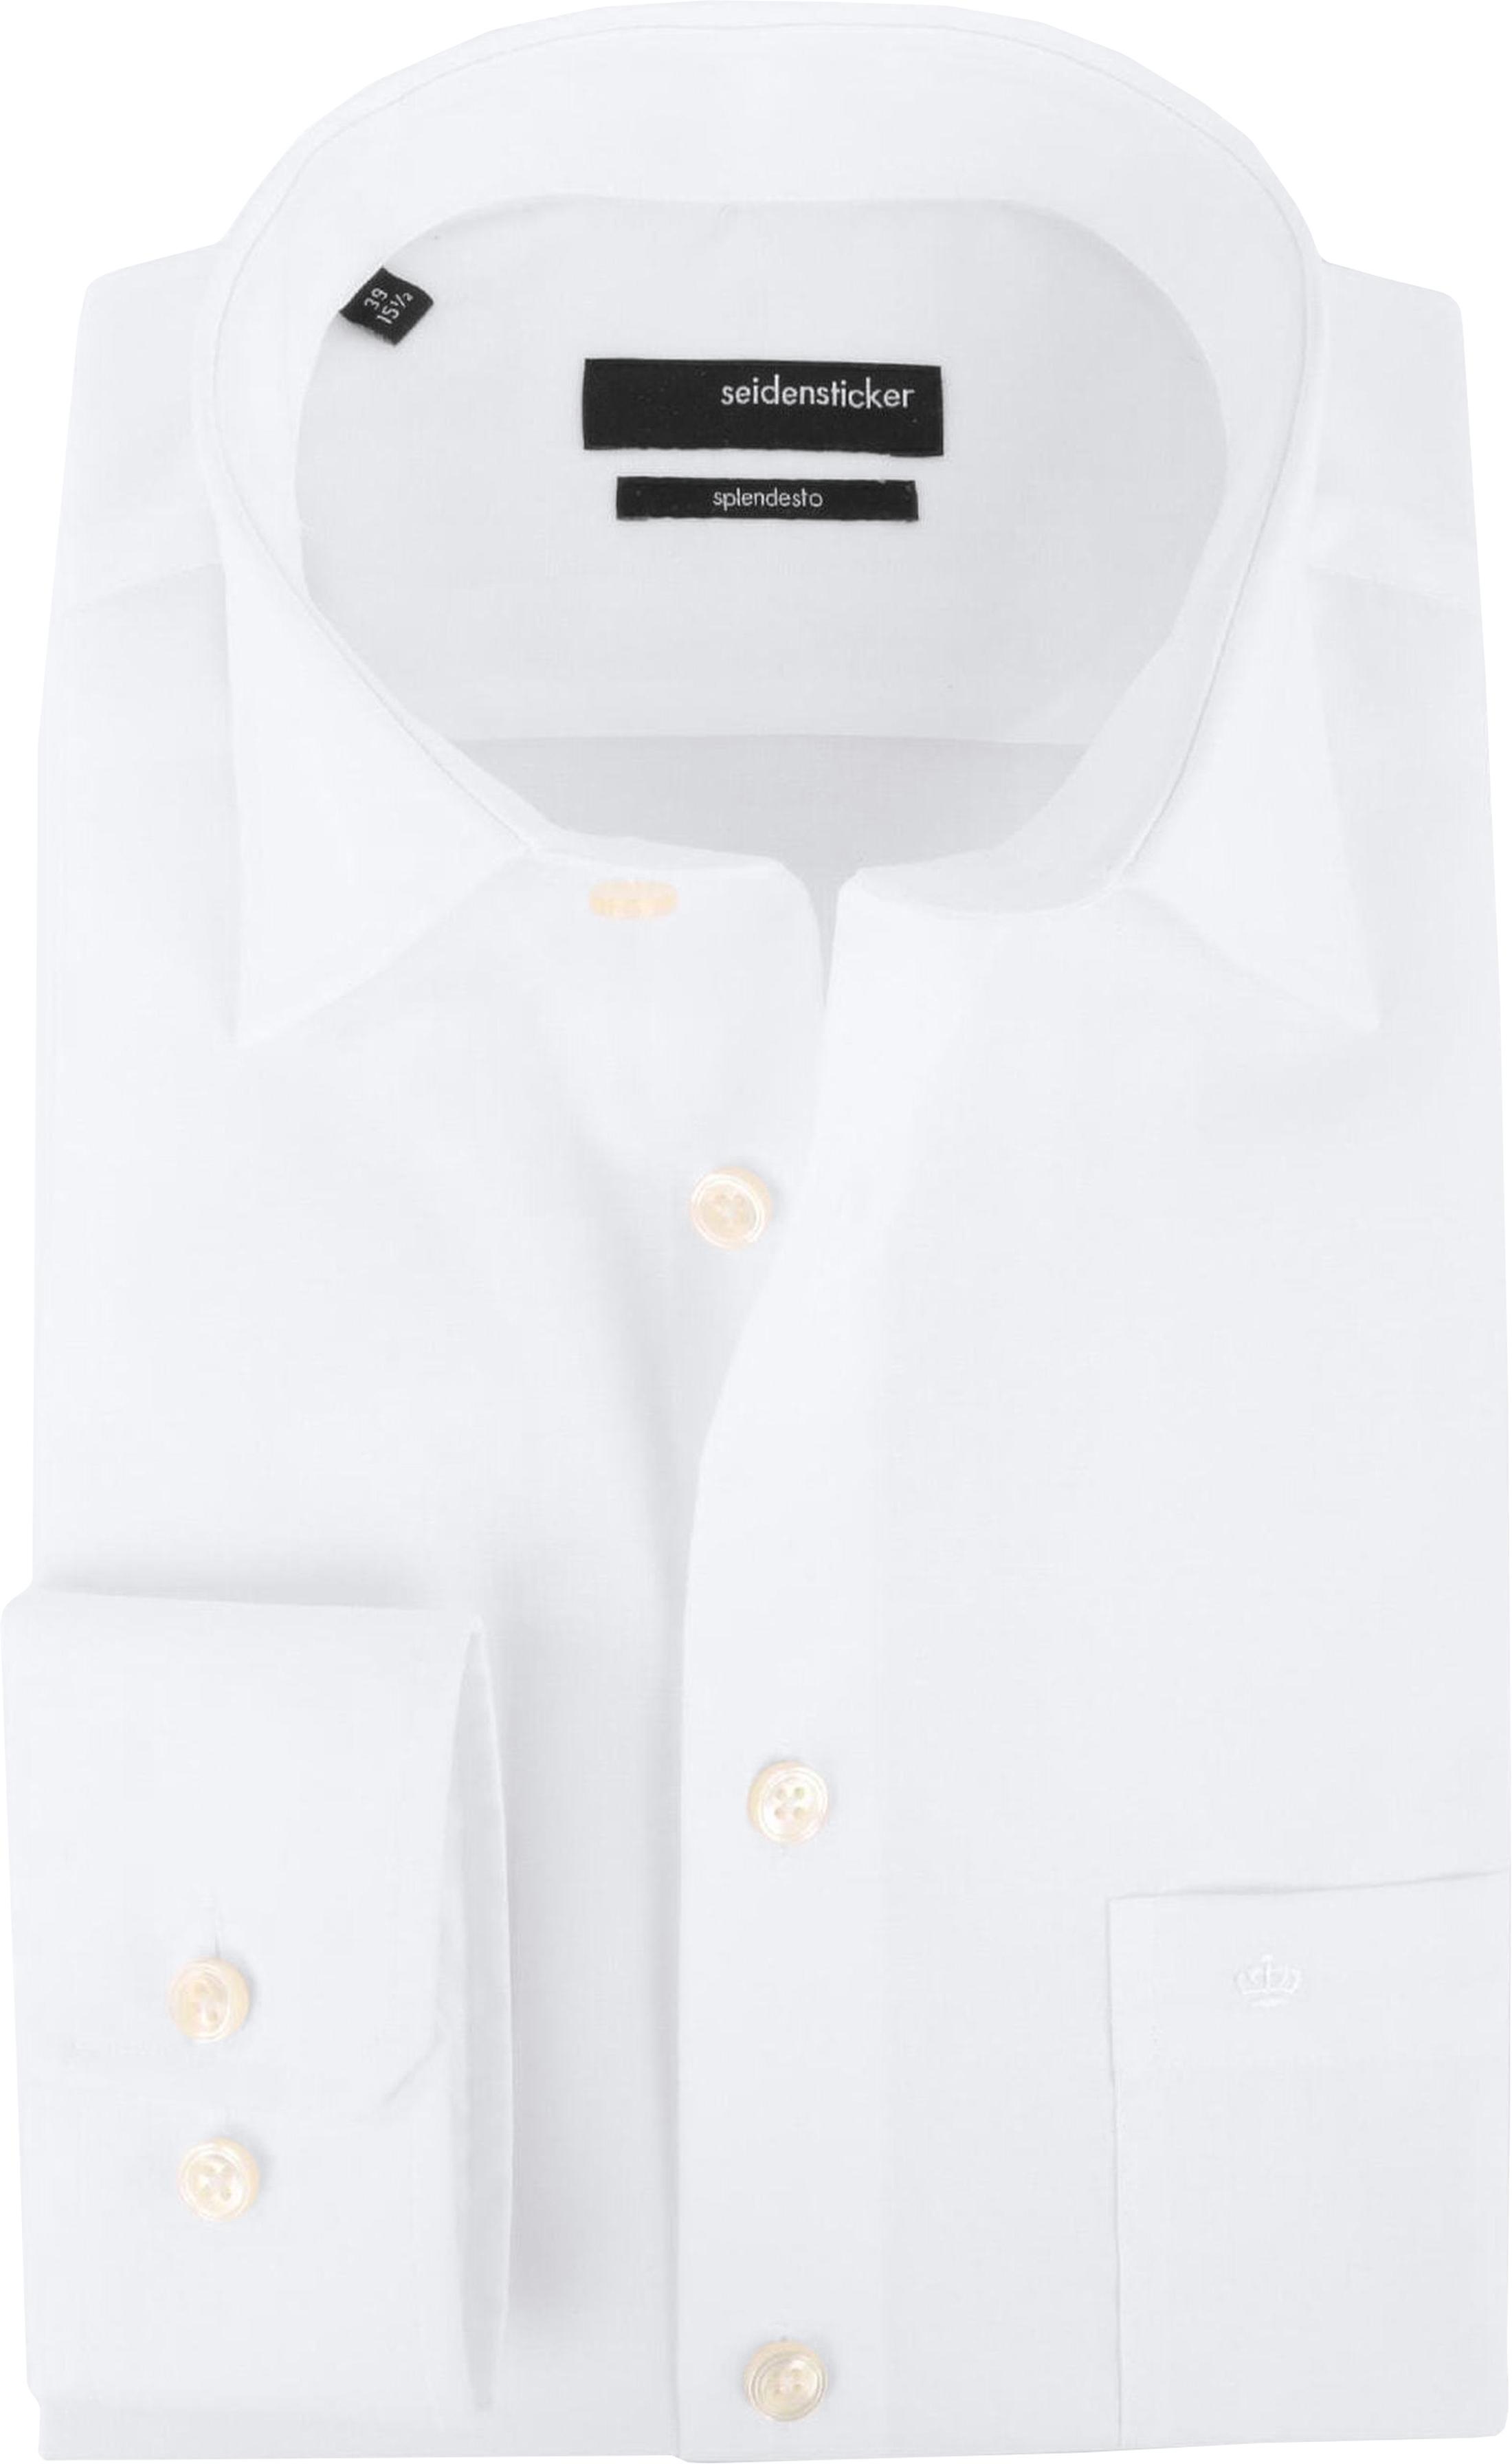 Seidensticker Splendesto Overhemd Wit foto 0